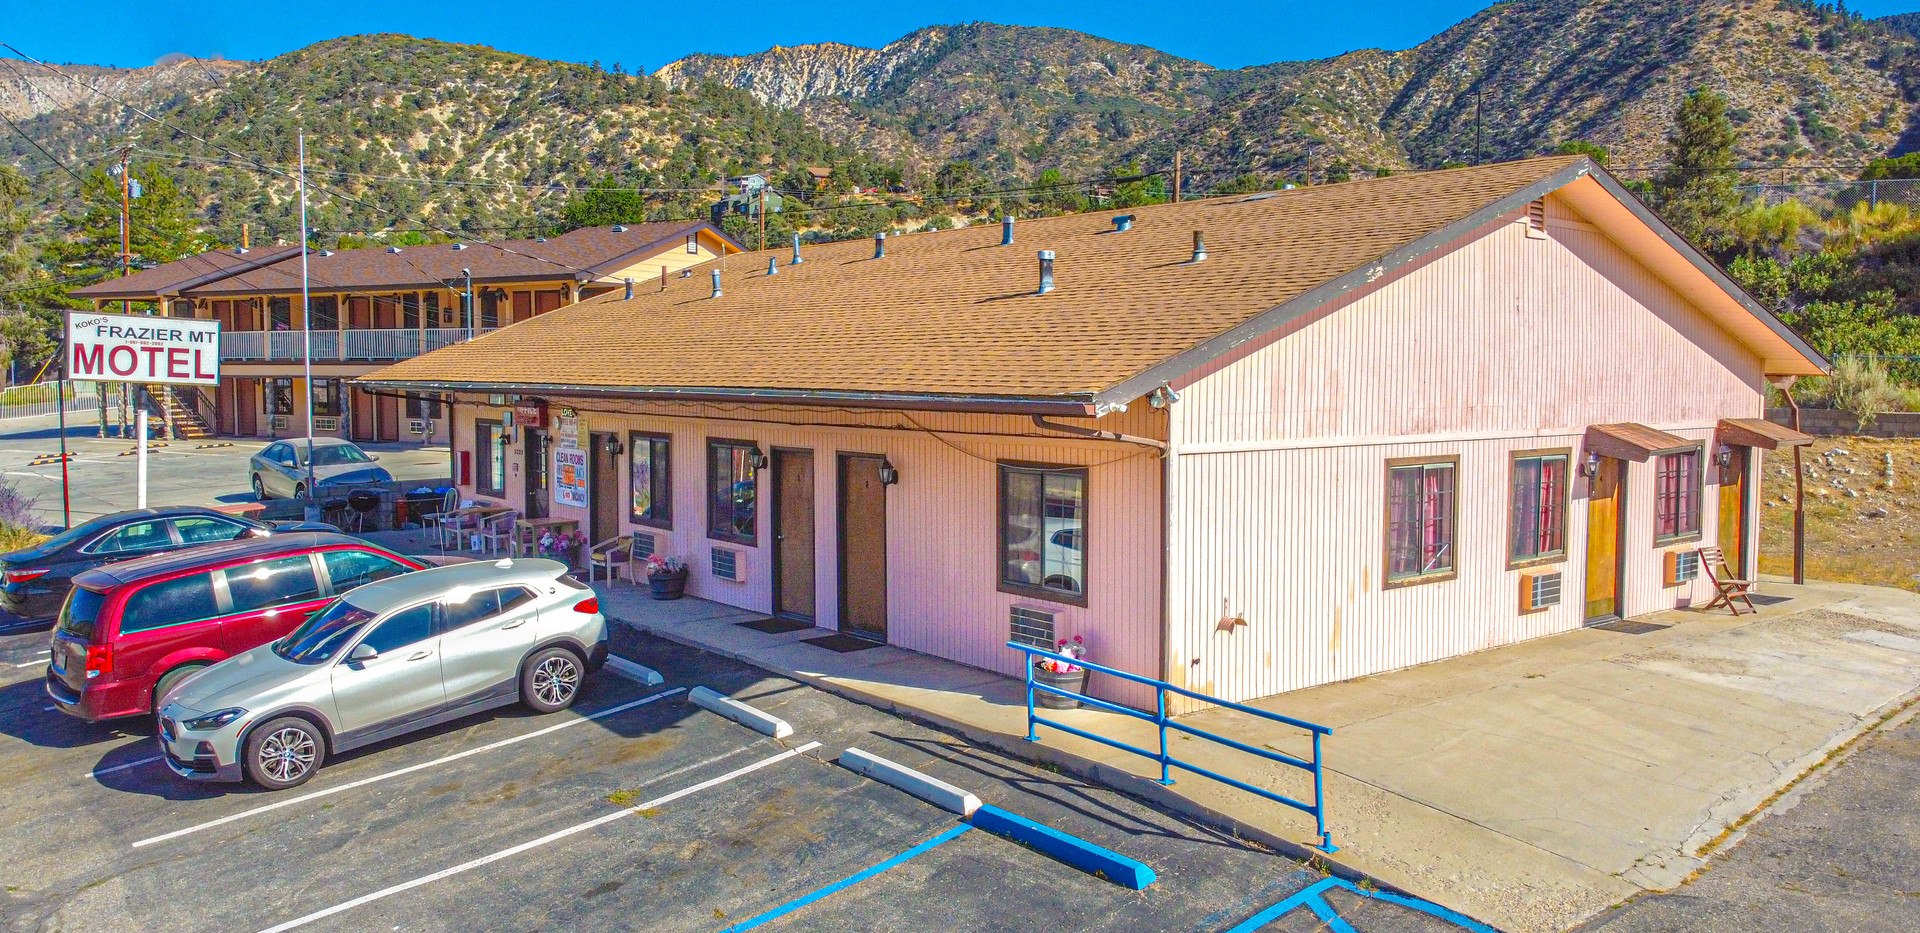 Koko's Mountain Motel